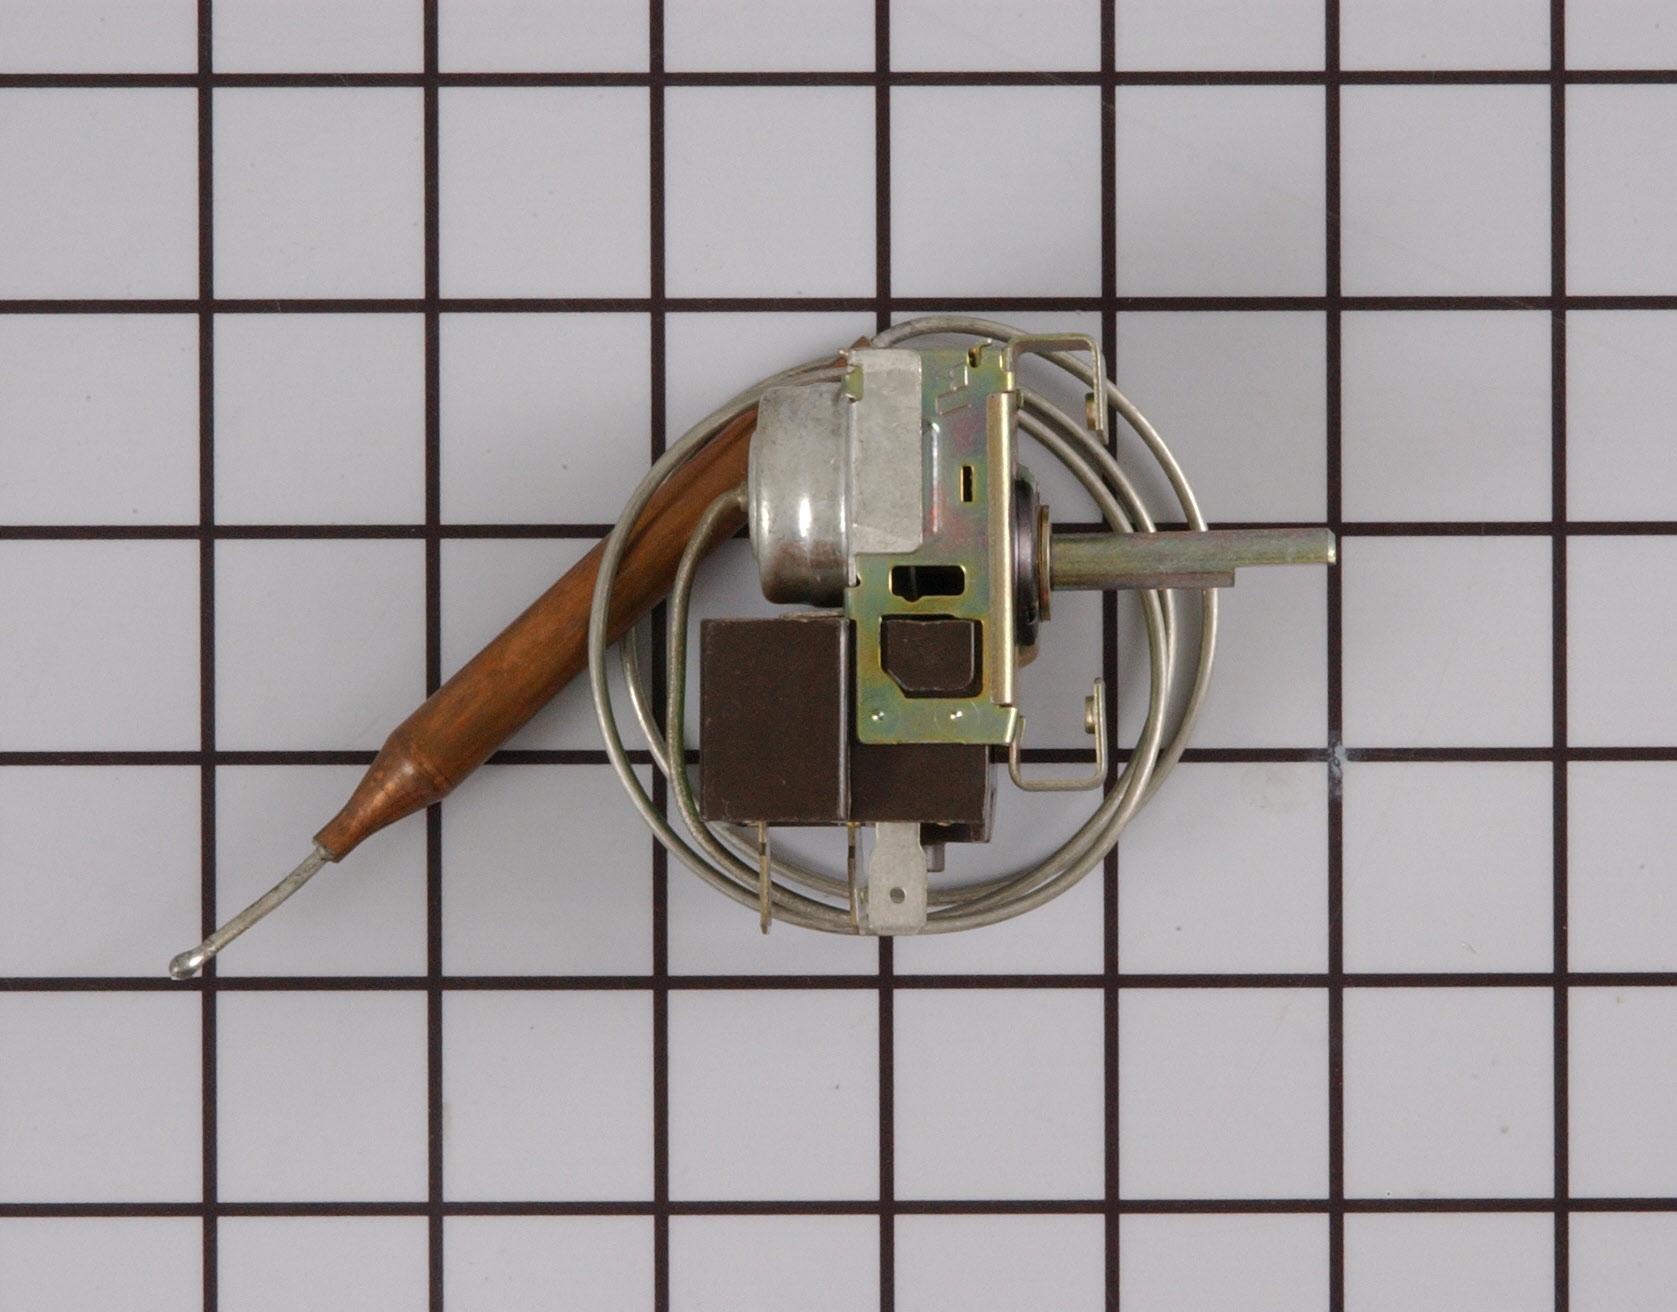 Kenmore Air Conditioner Part # 5303201970 - Temperature Control Thermostat